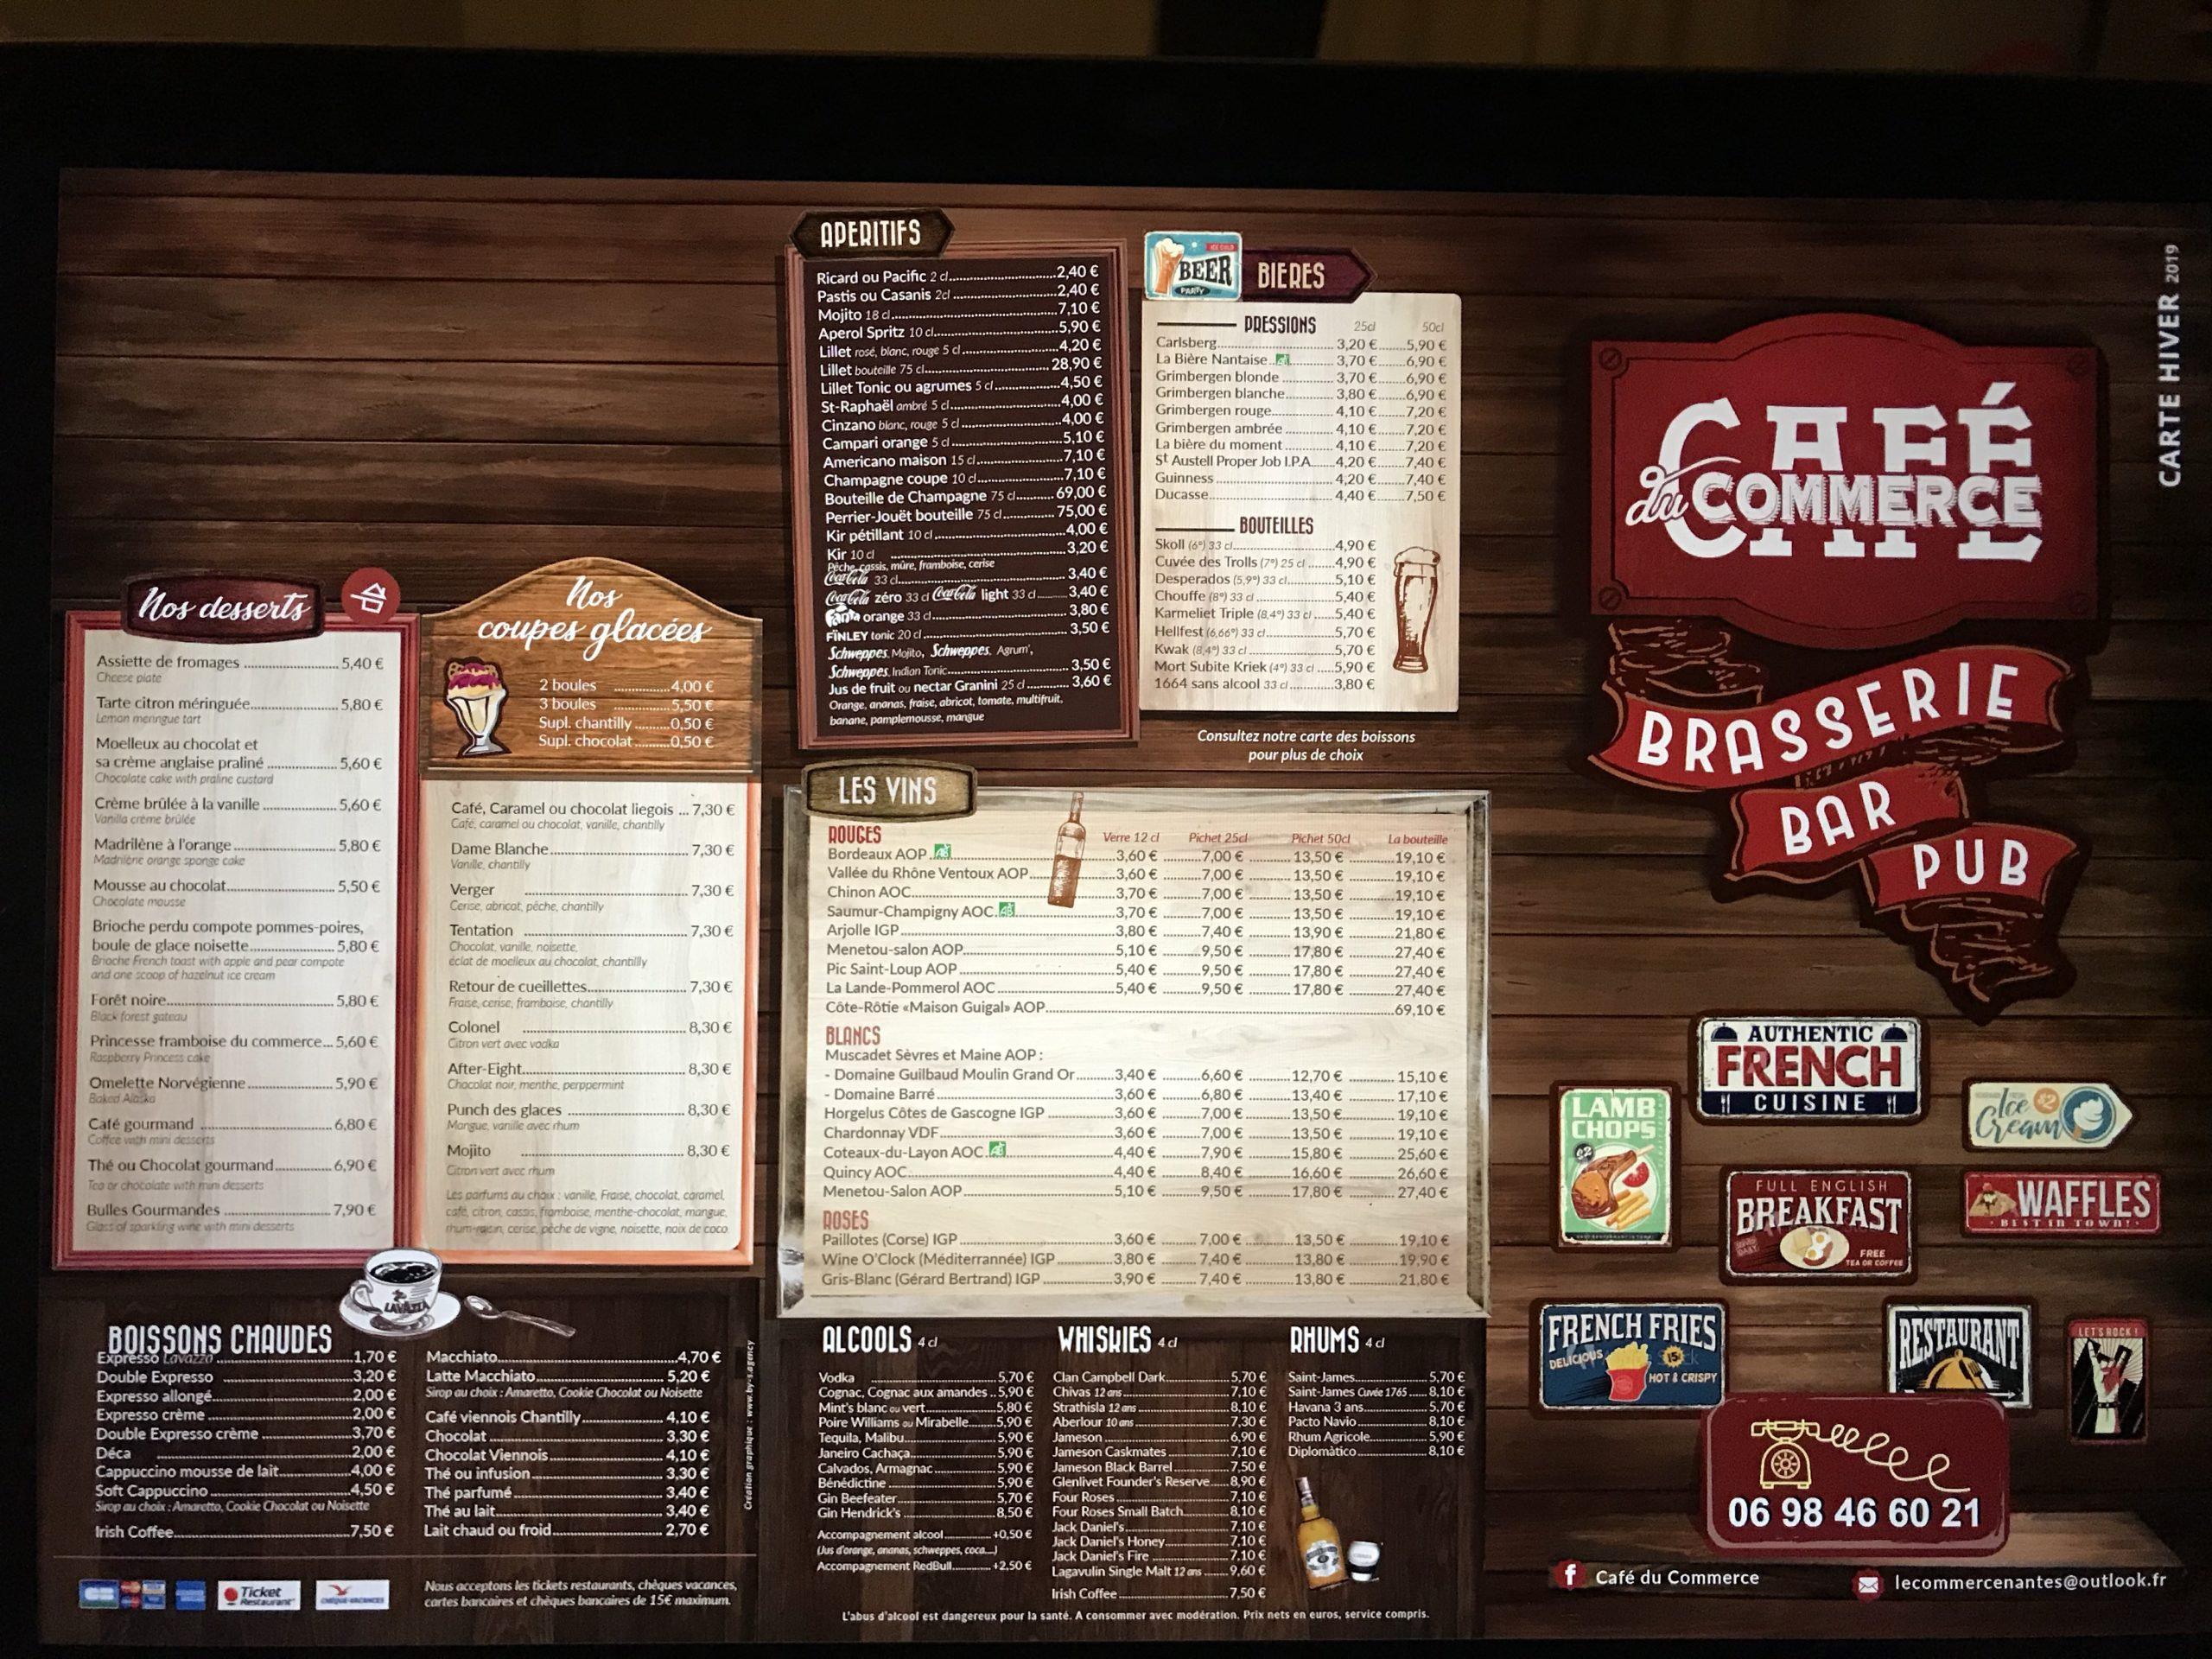 Braserie carte menu